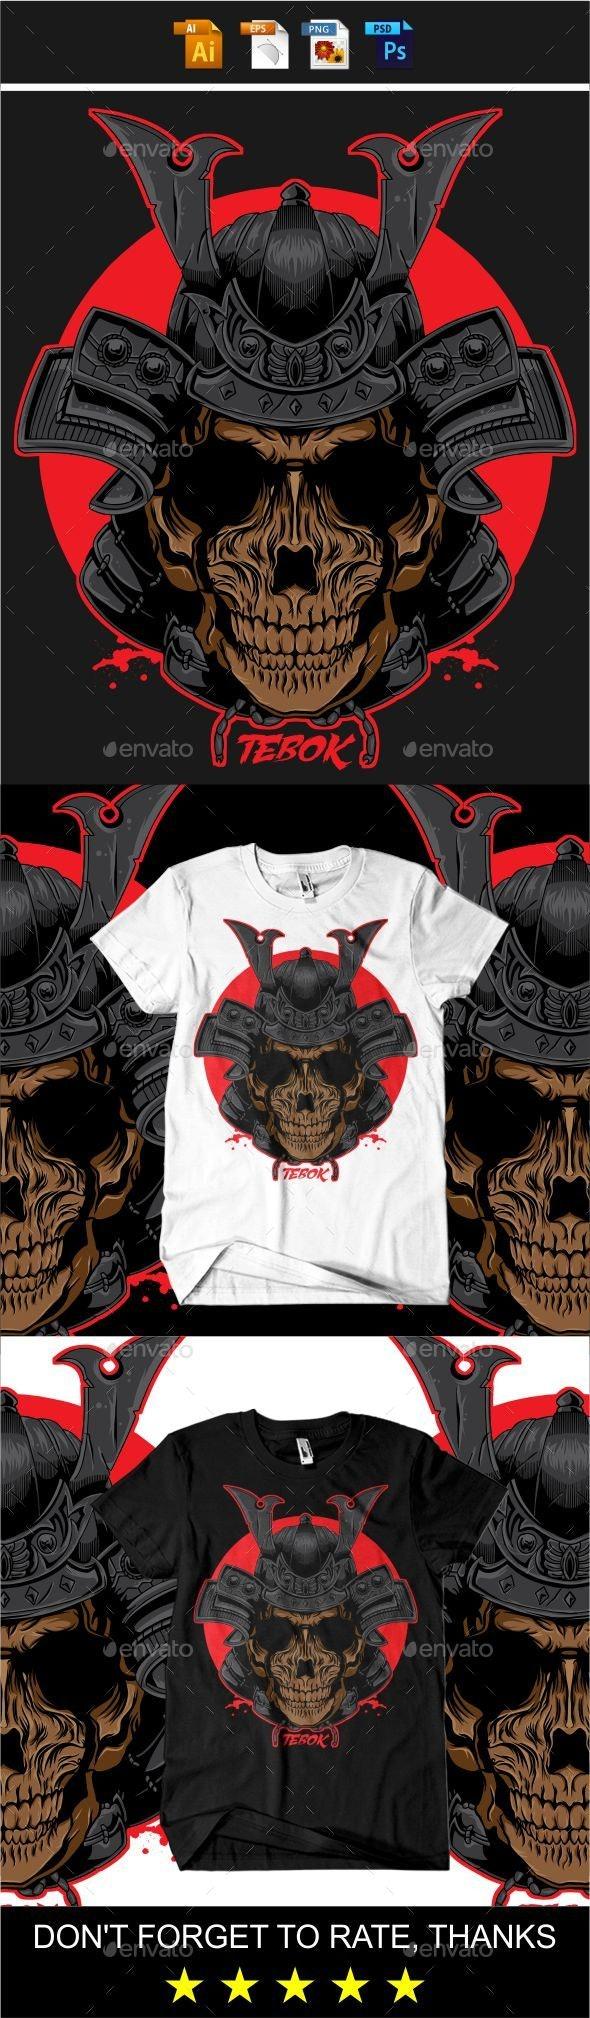 Samurai T-shirt design - Grunge Designs